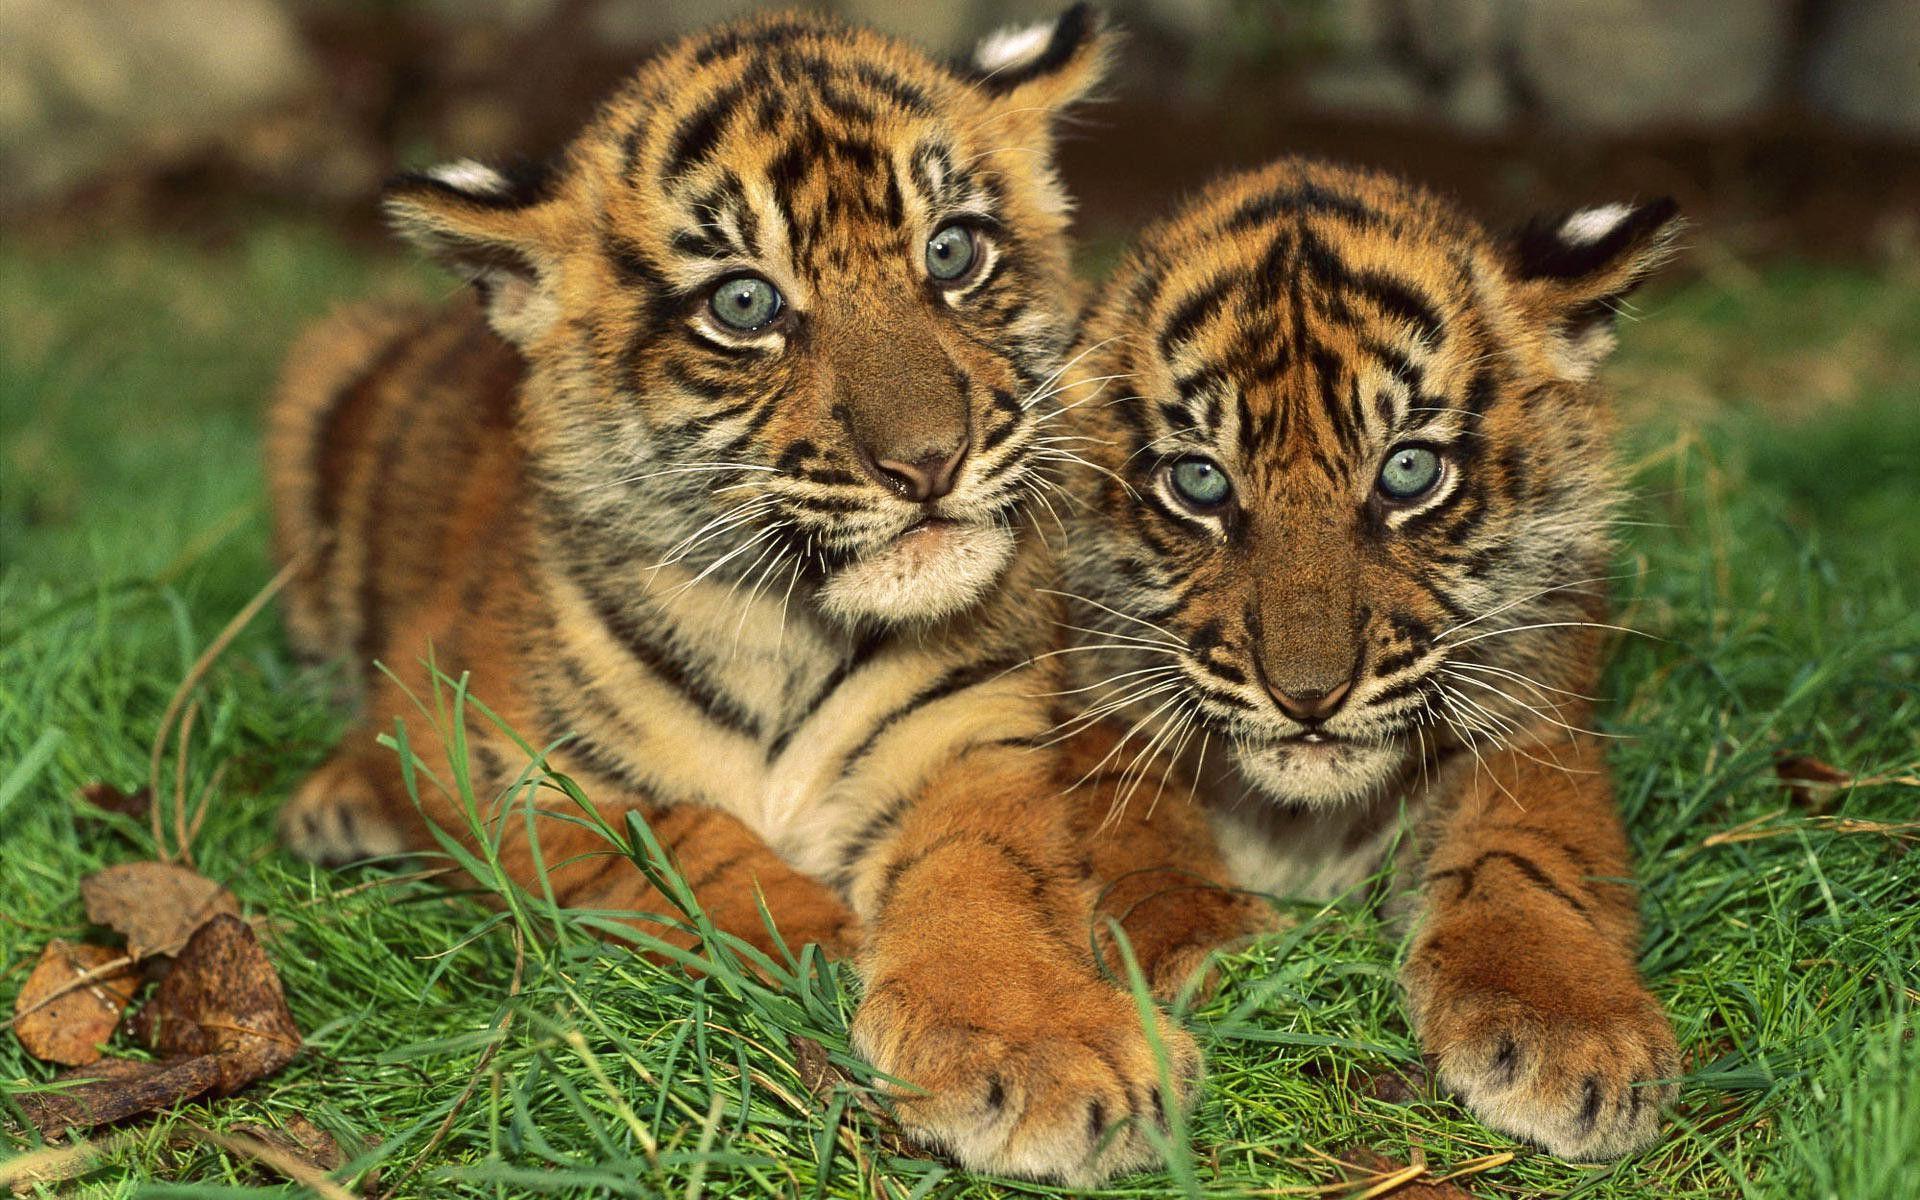 babys mit tiere baby tigers wallpaper tierbabys pinterest s e baby tiere tiere und. Black Bedroom Furniture Sets. Home Design Ideas